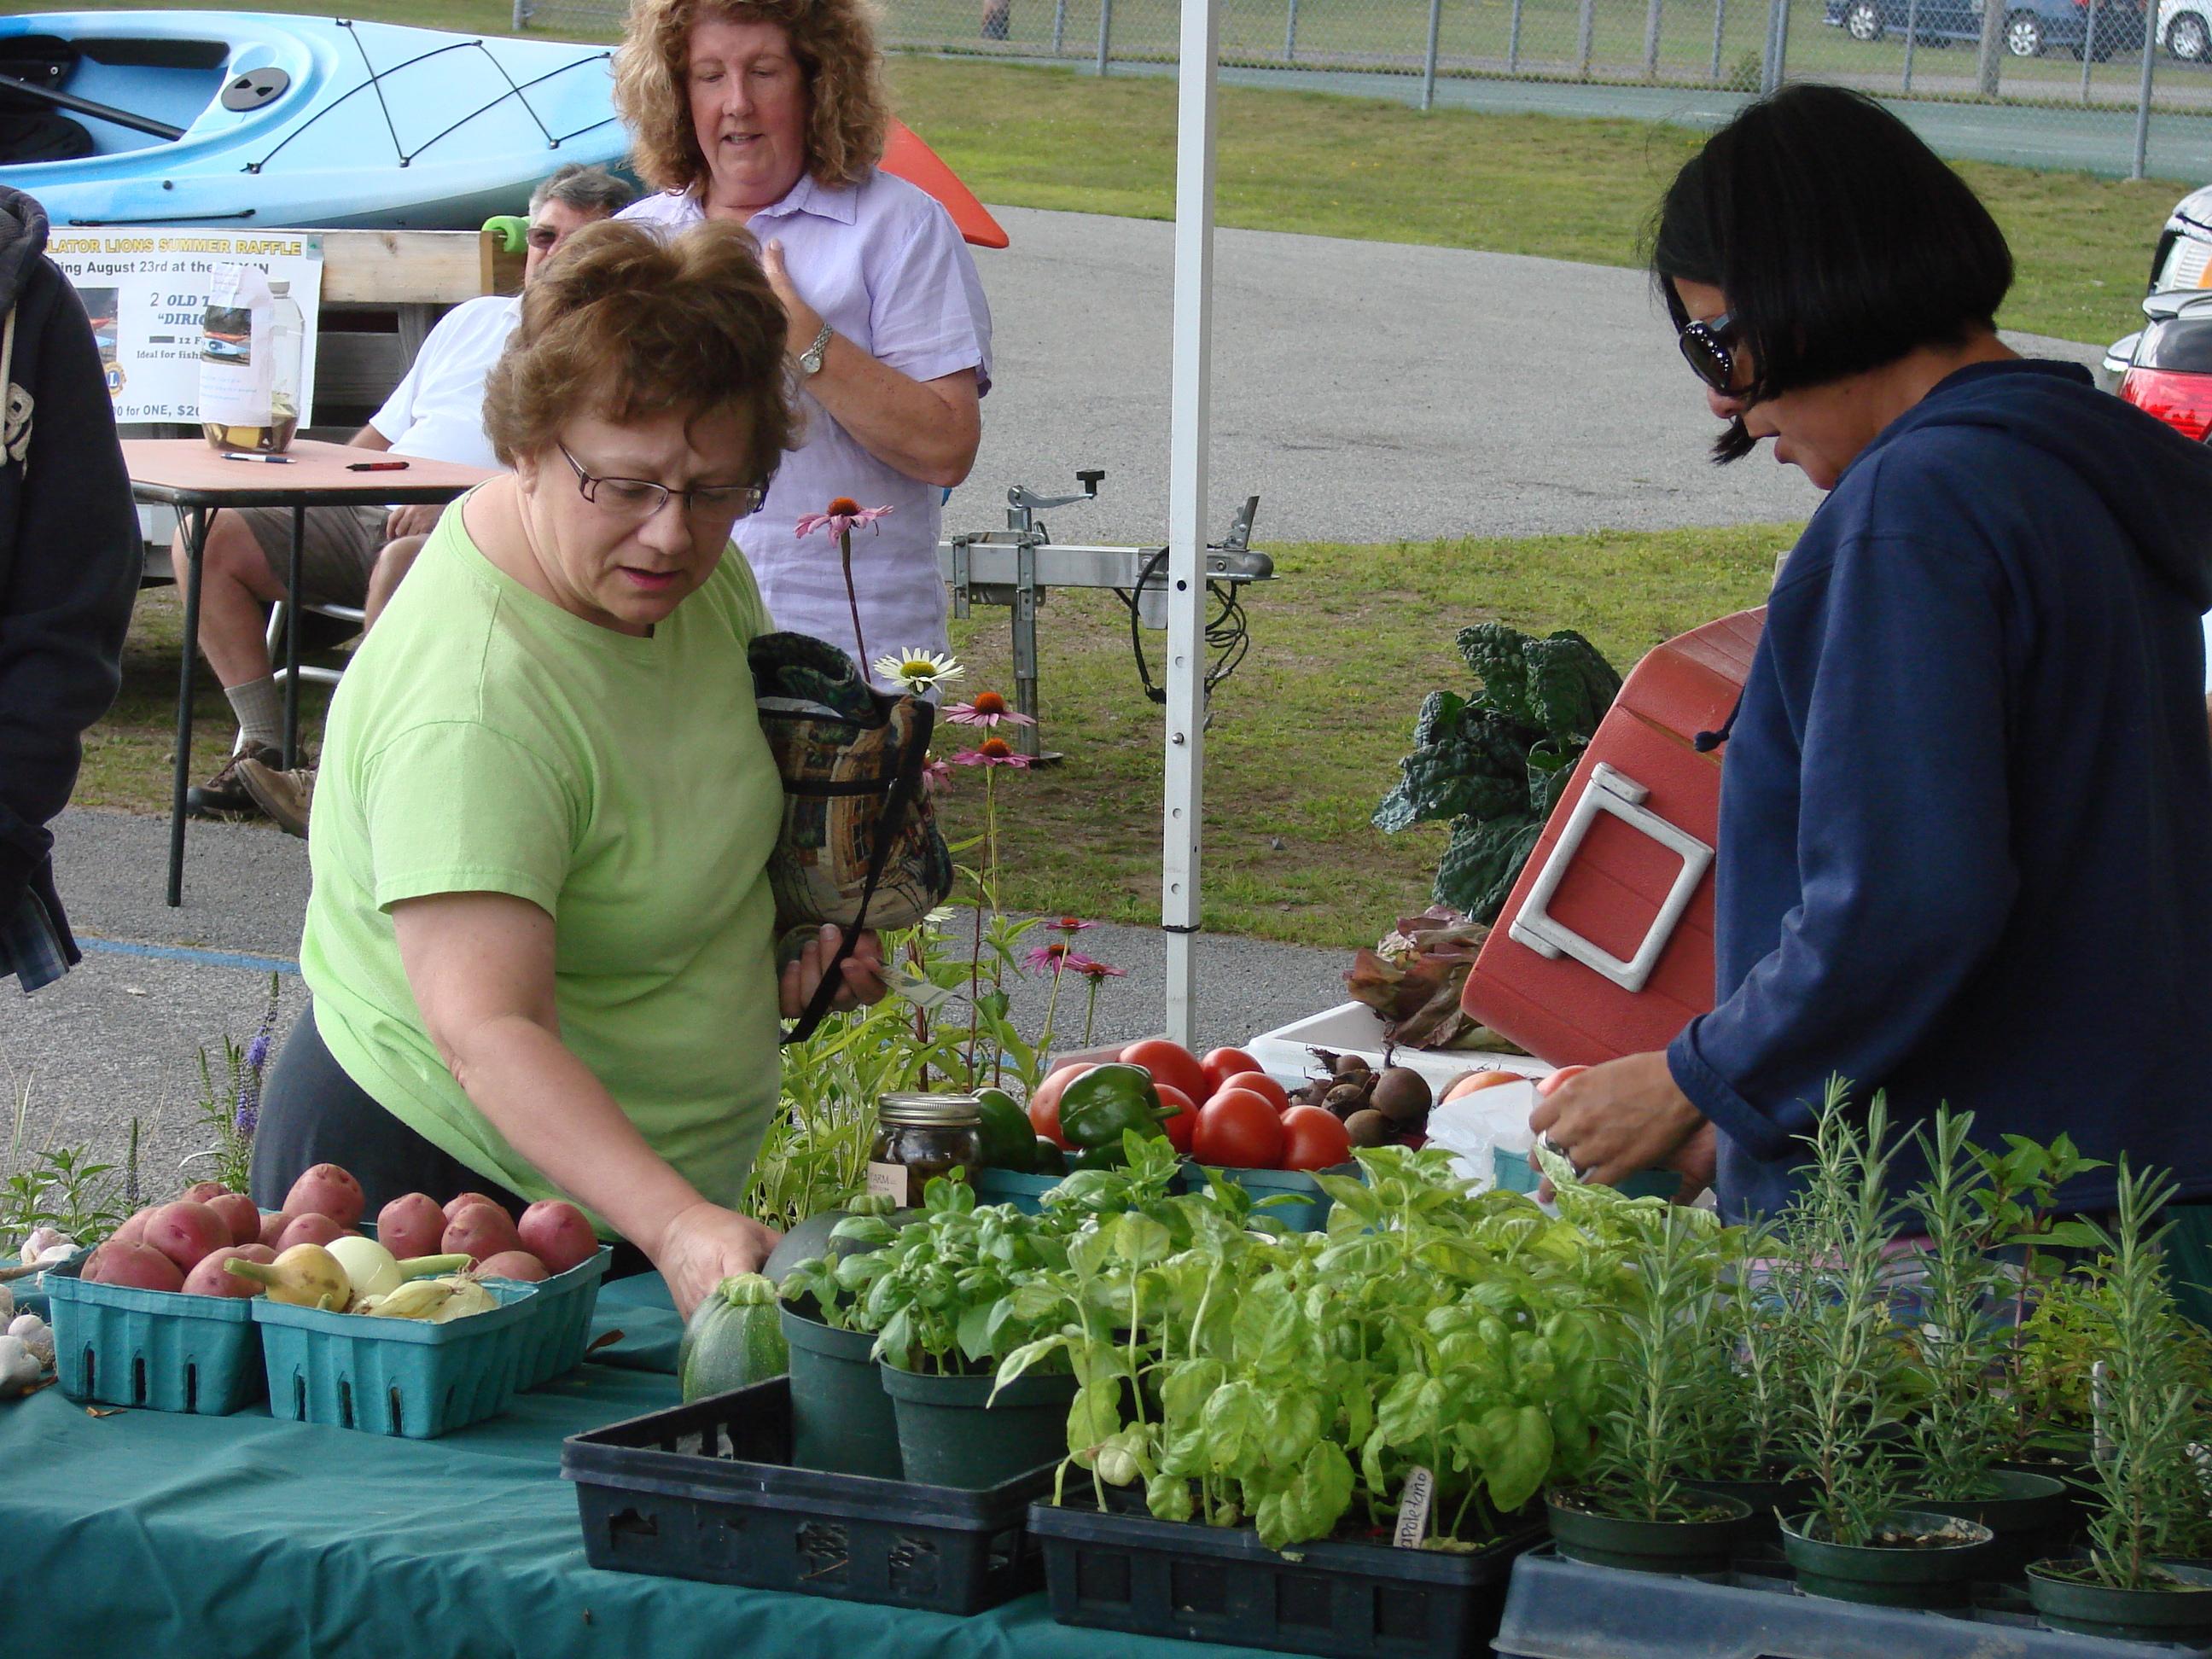 Speculator Farmers Market